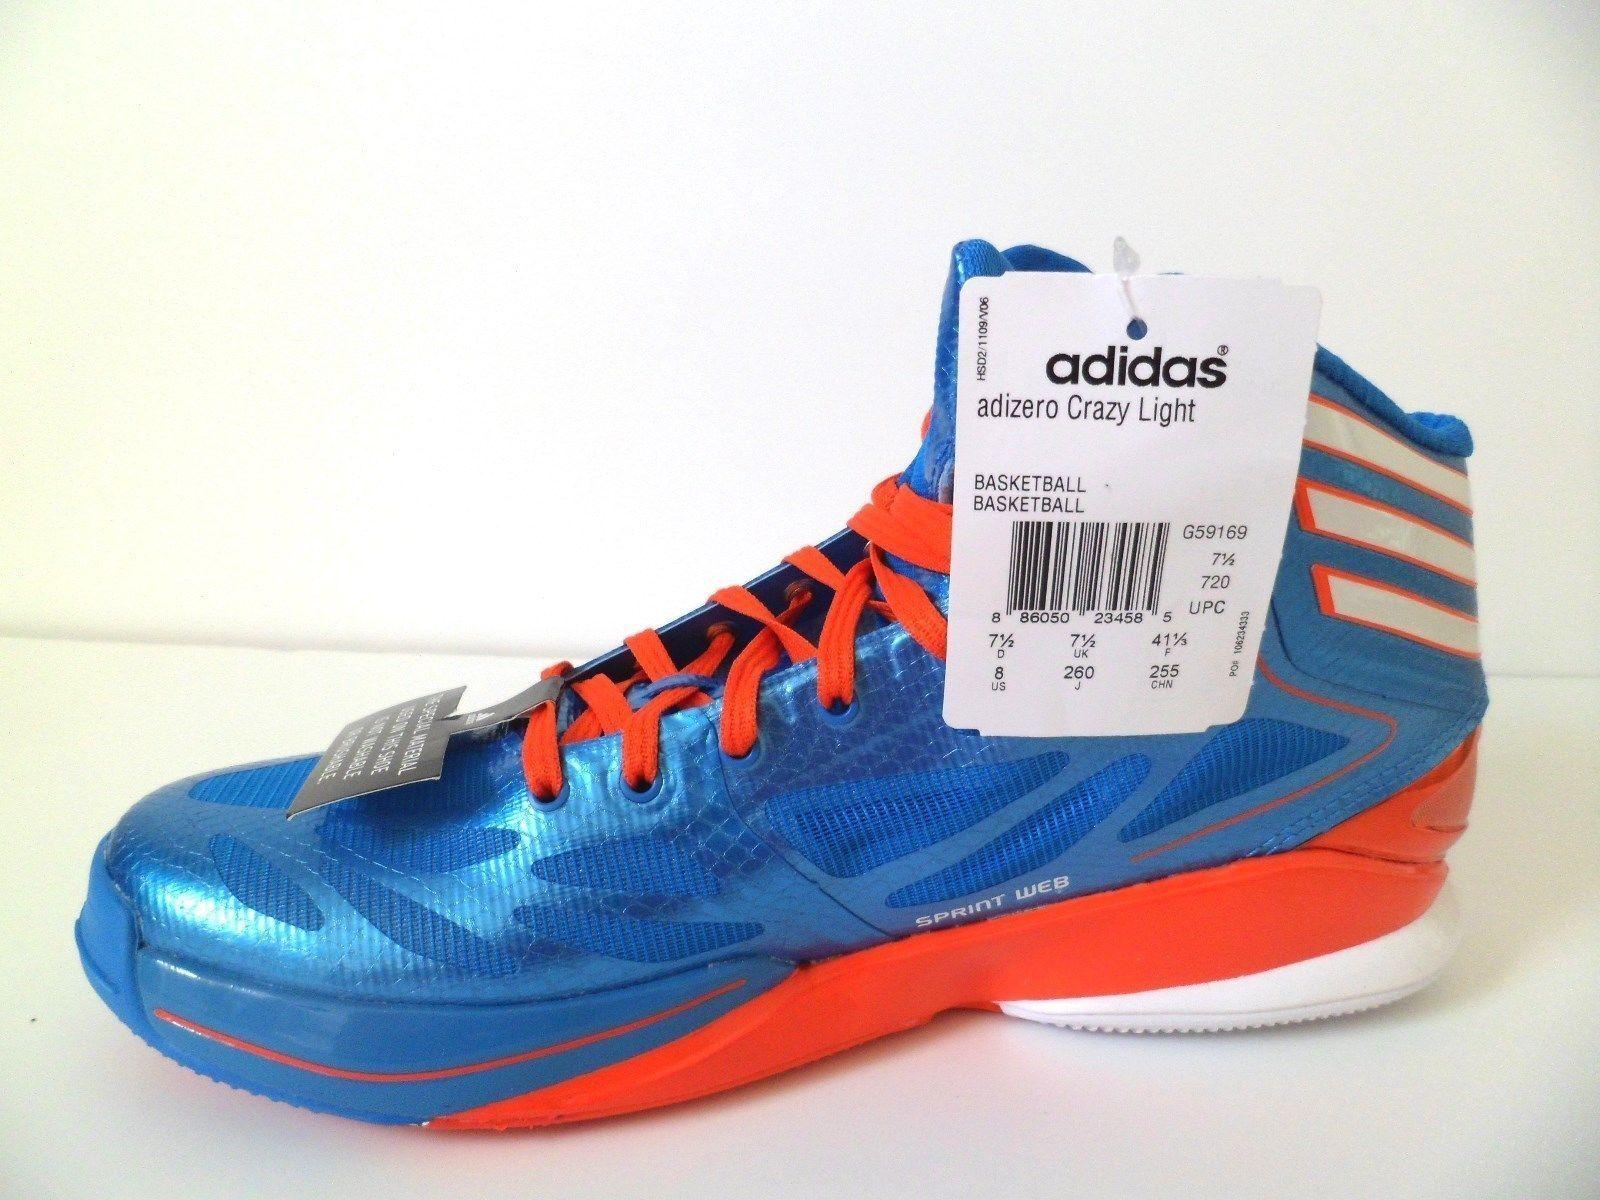 New Adidas Adizero Crazy [G59169] Basketball Bright bluee High Energy Red Sz 8